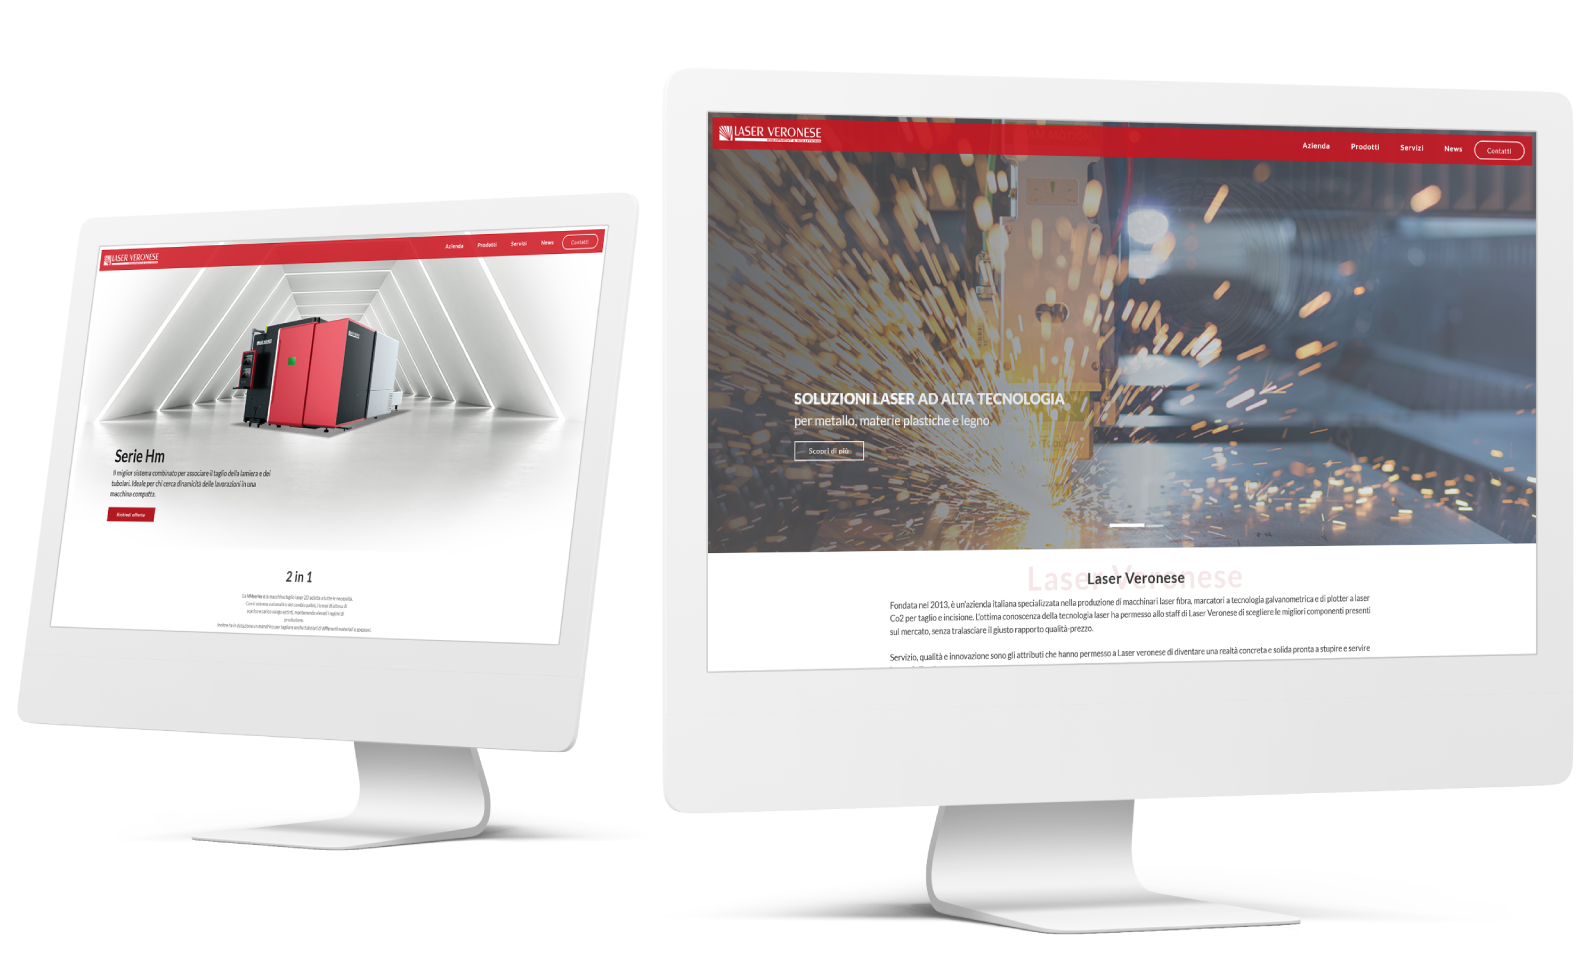 Sito web Verona - Sito web responsive Laser Veronese   OIS